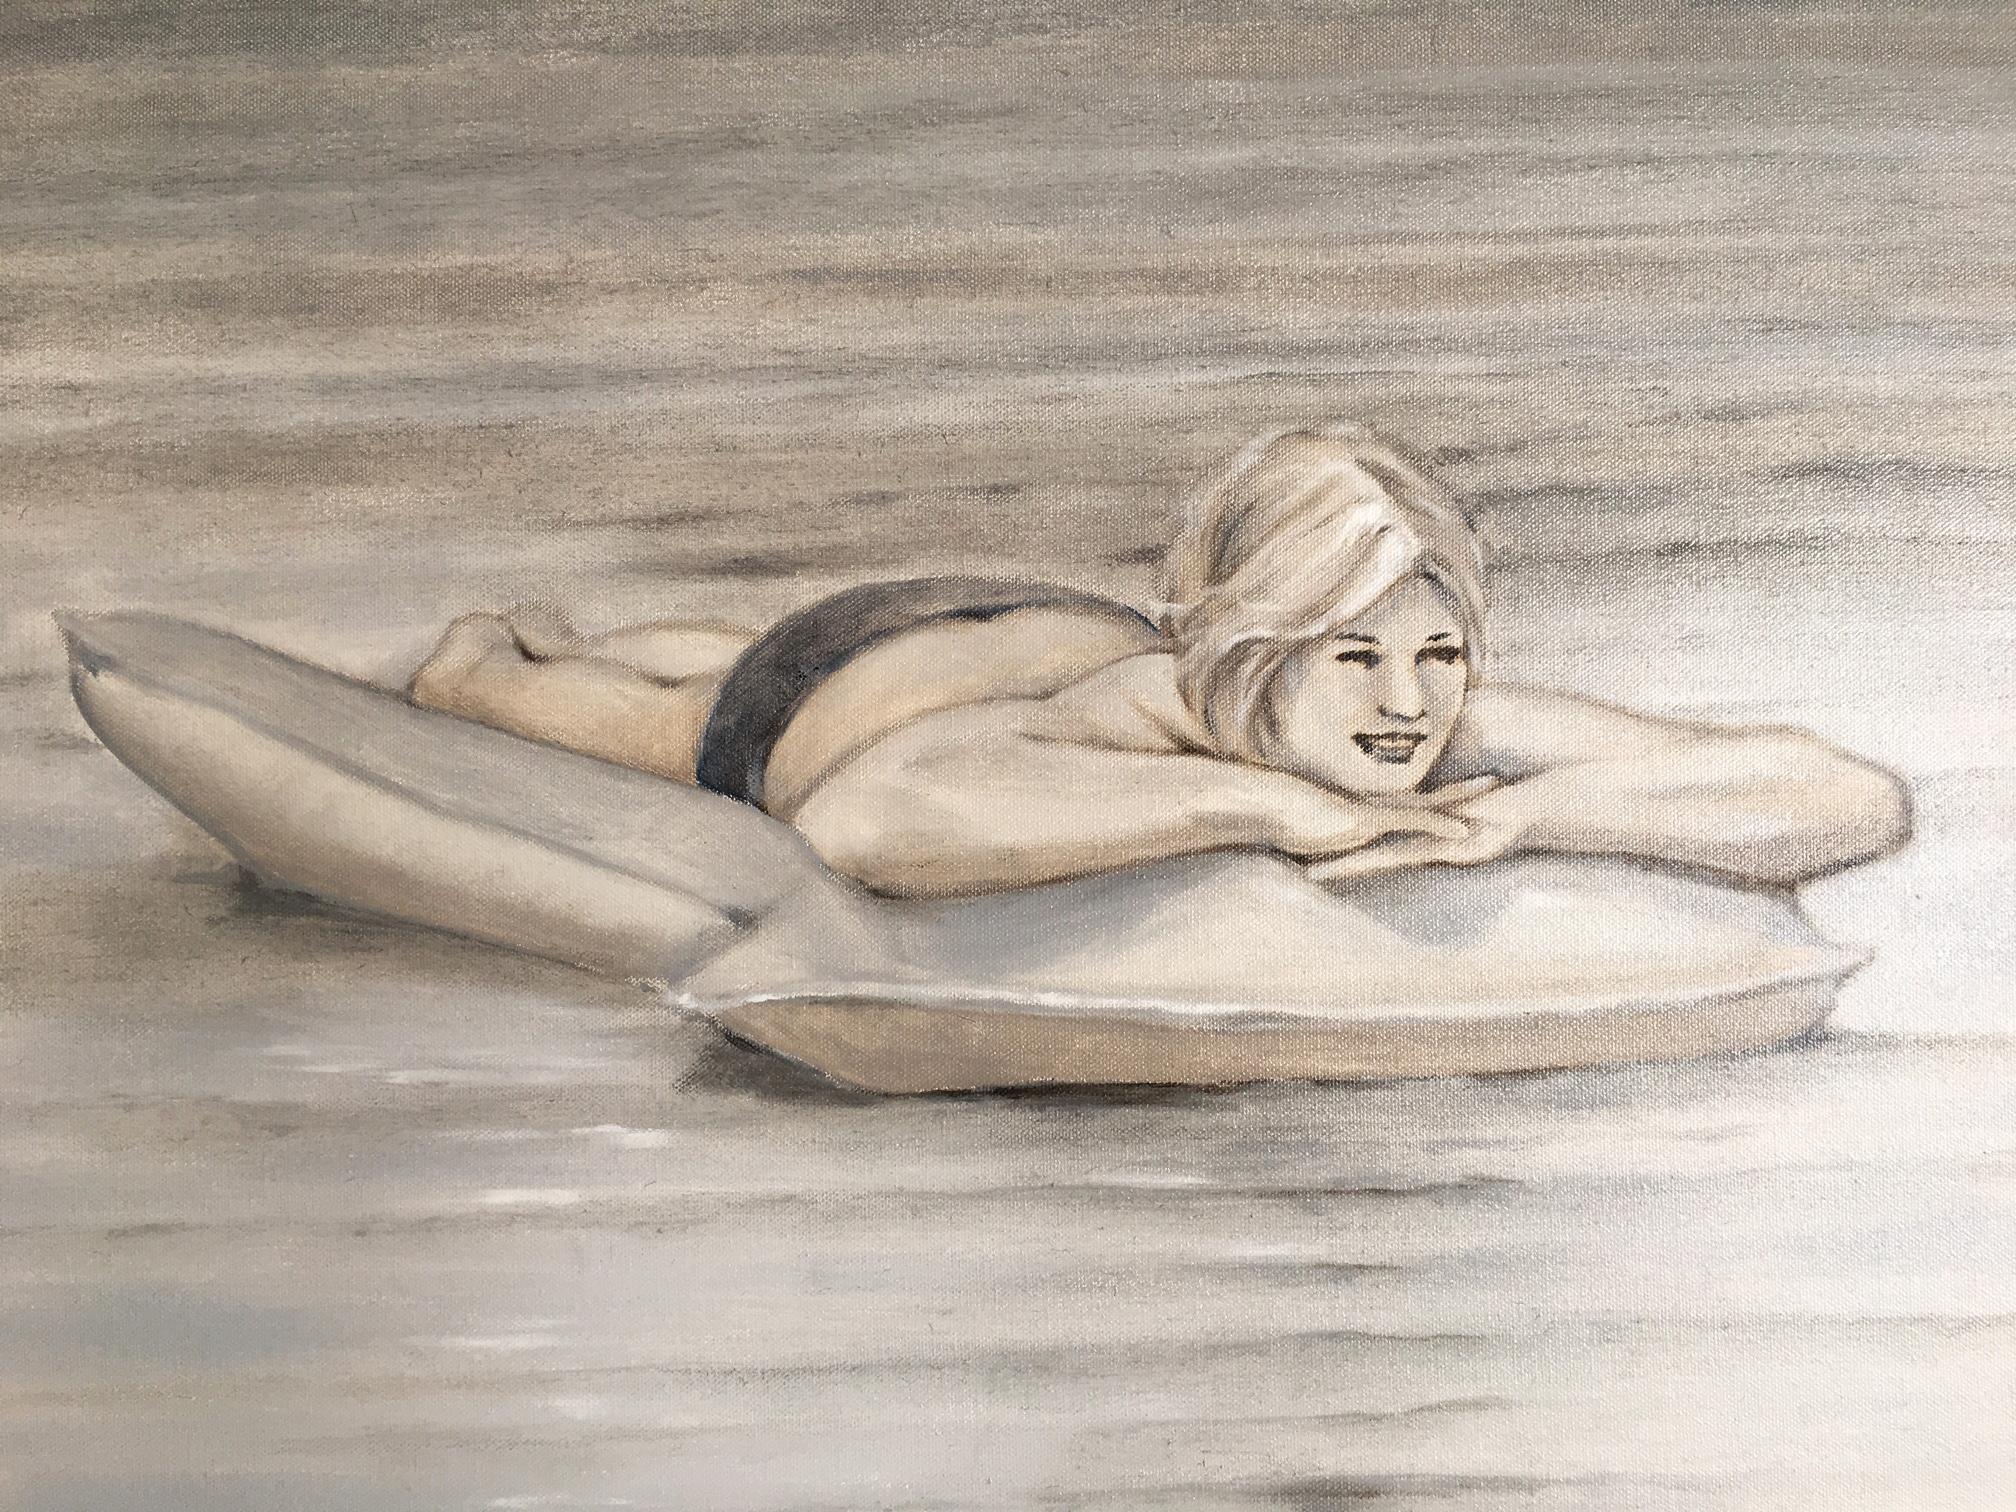 Raft Lady, 2016